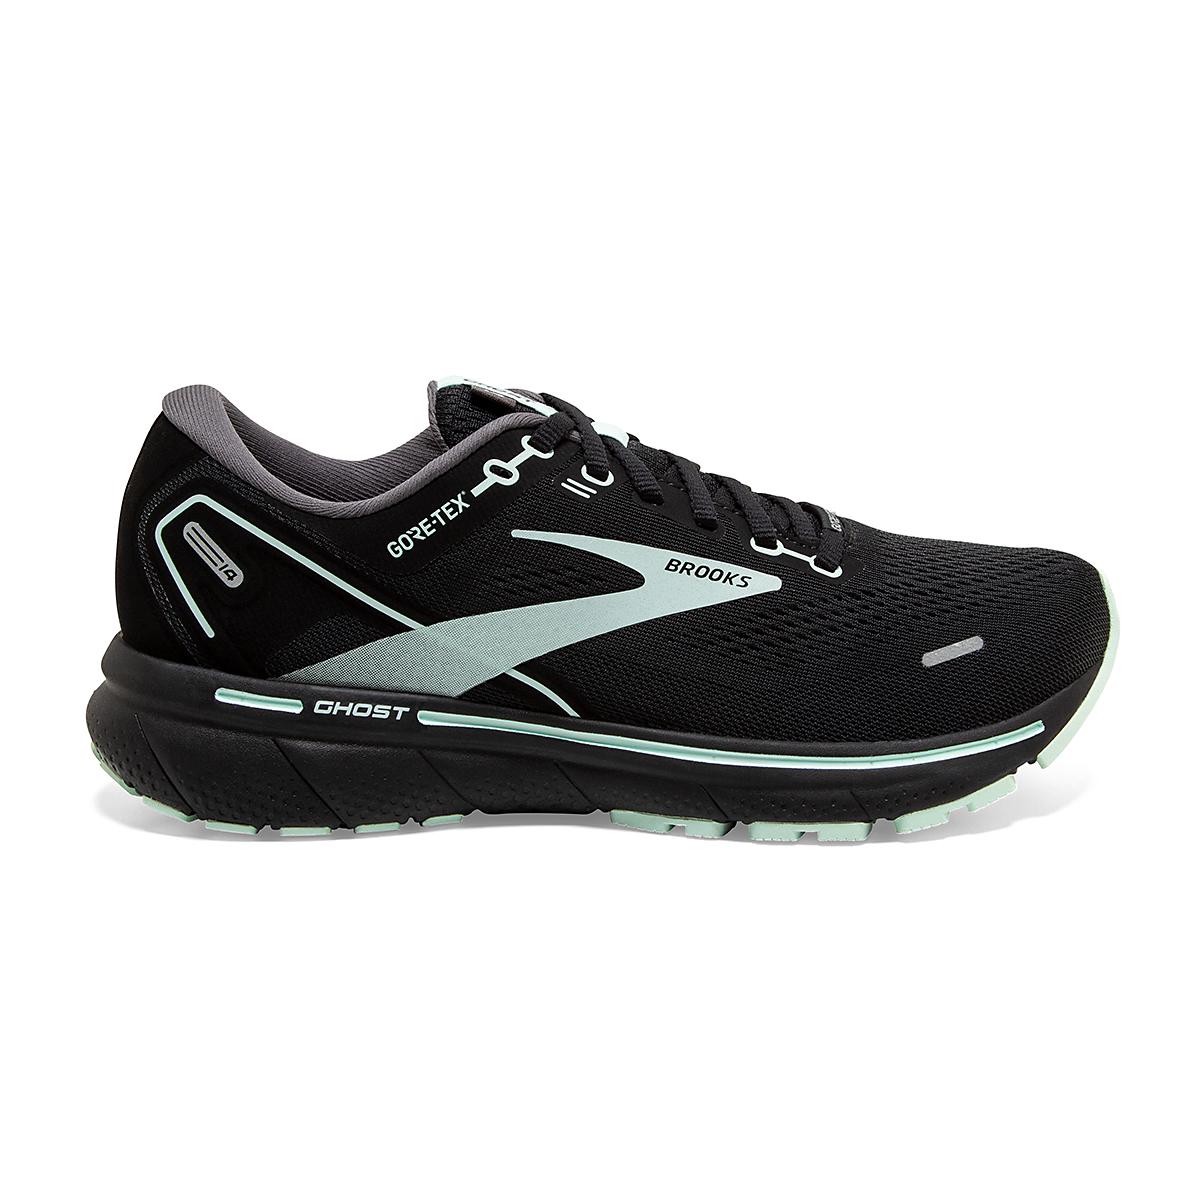 Women's Brooks Ghost 14 Gore-Tex Running Shoe - Color: Black/Blackened Pearl/Aquaglass - Size: 5 - Width: Regular, Black/Blackened Pearl/Aquaglass, large, image 1